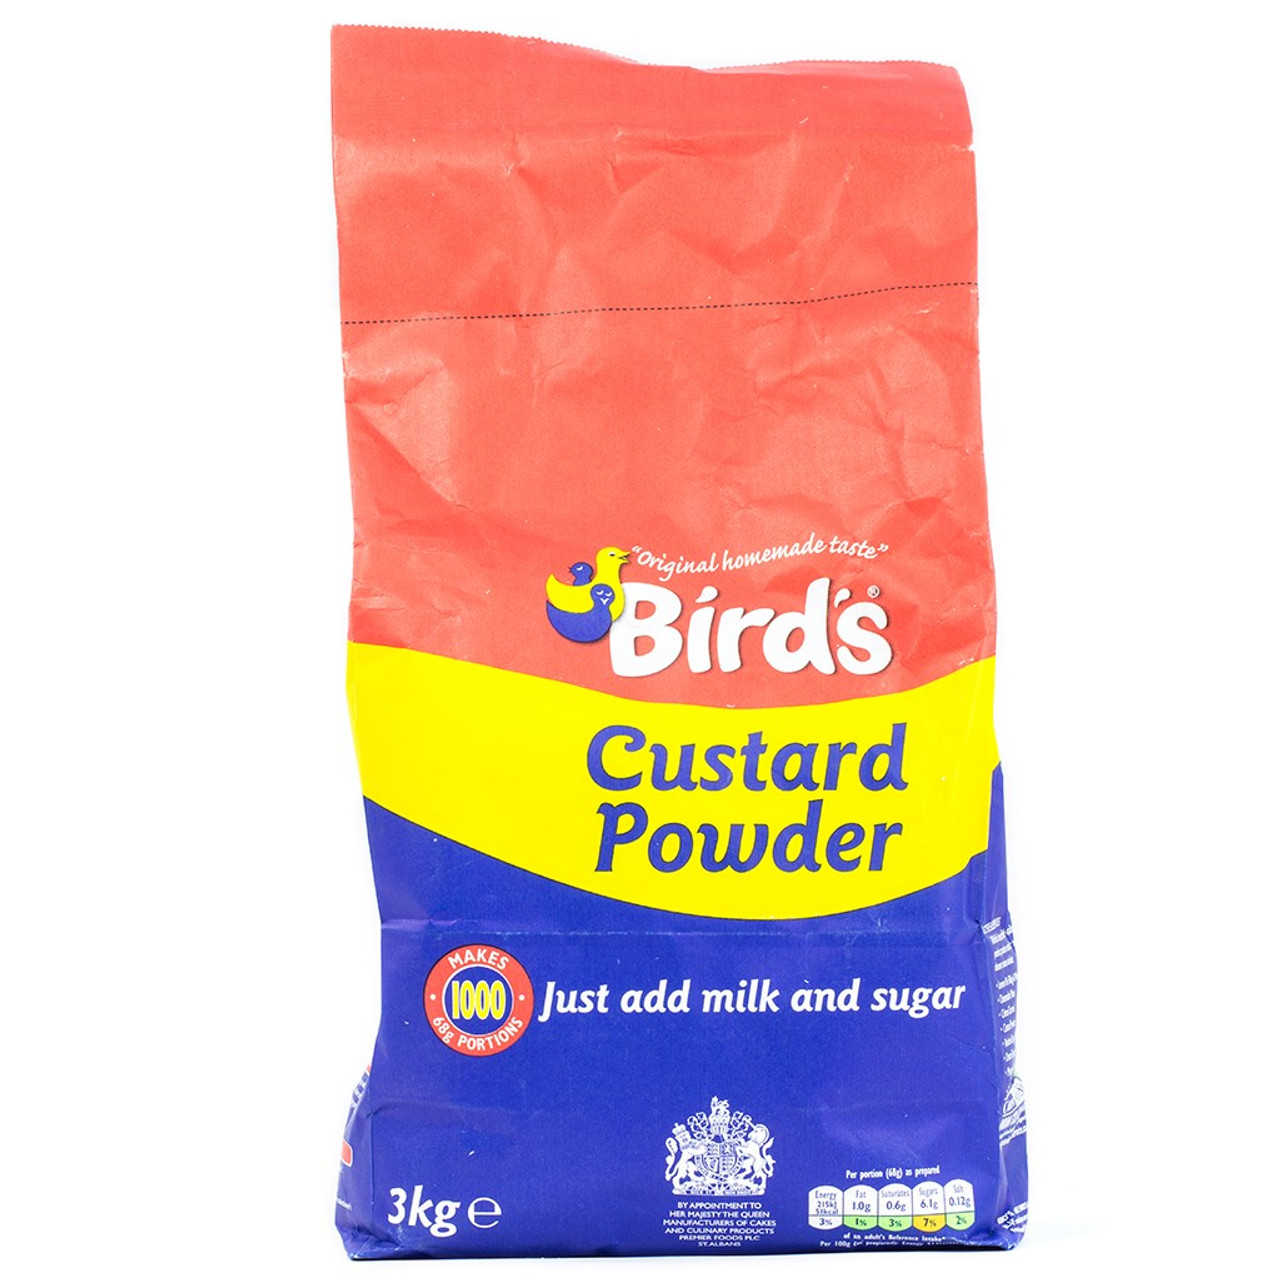 Bird's Custard Powder 3kg